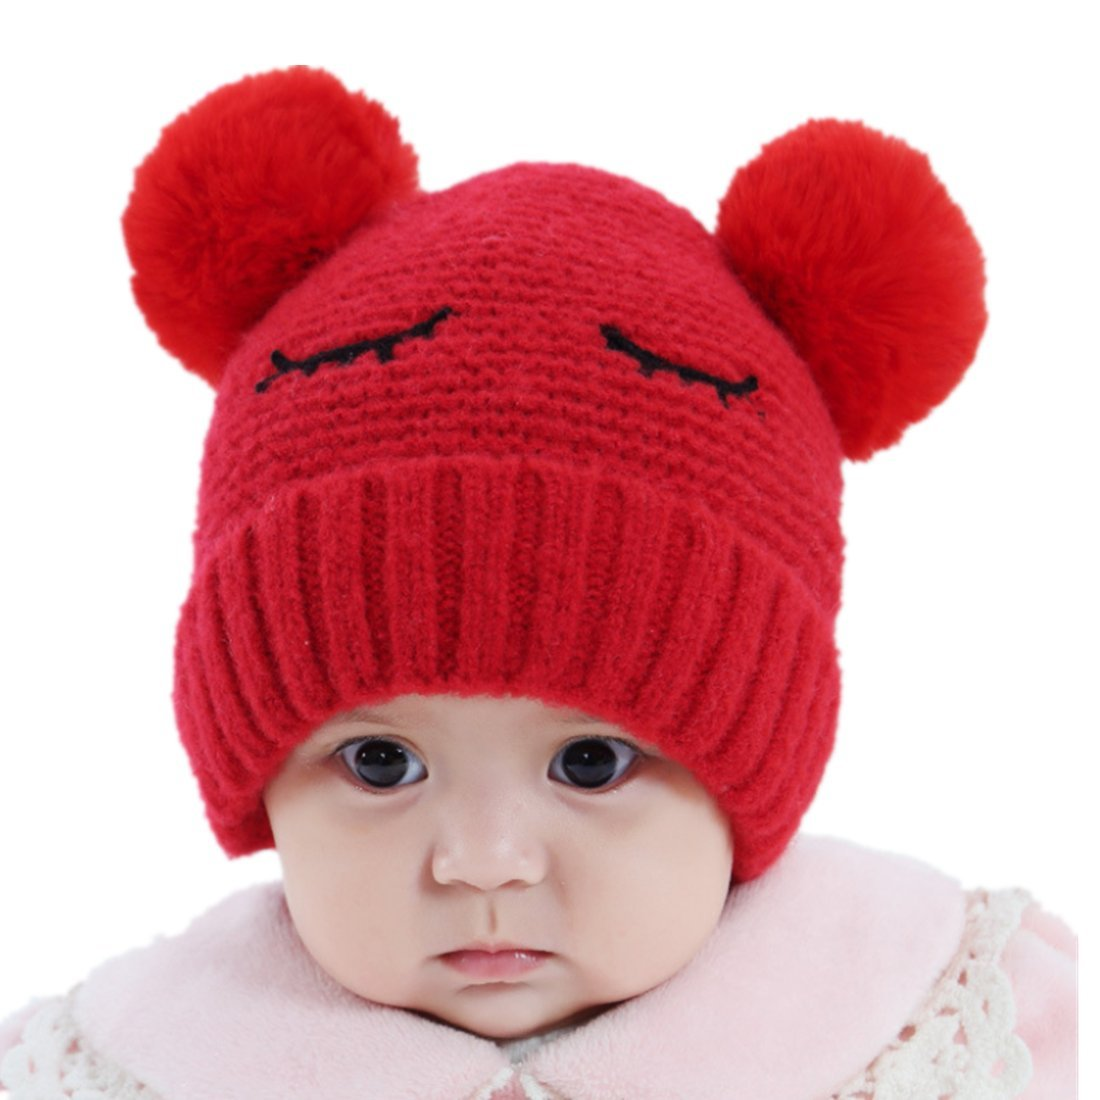 5eb41b97 Baby Boys Girls Pompom Hat Props Crochet Knitted Double Pom Pom Hat ...